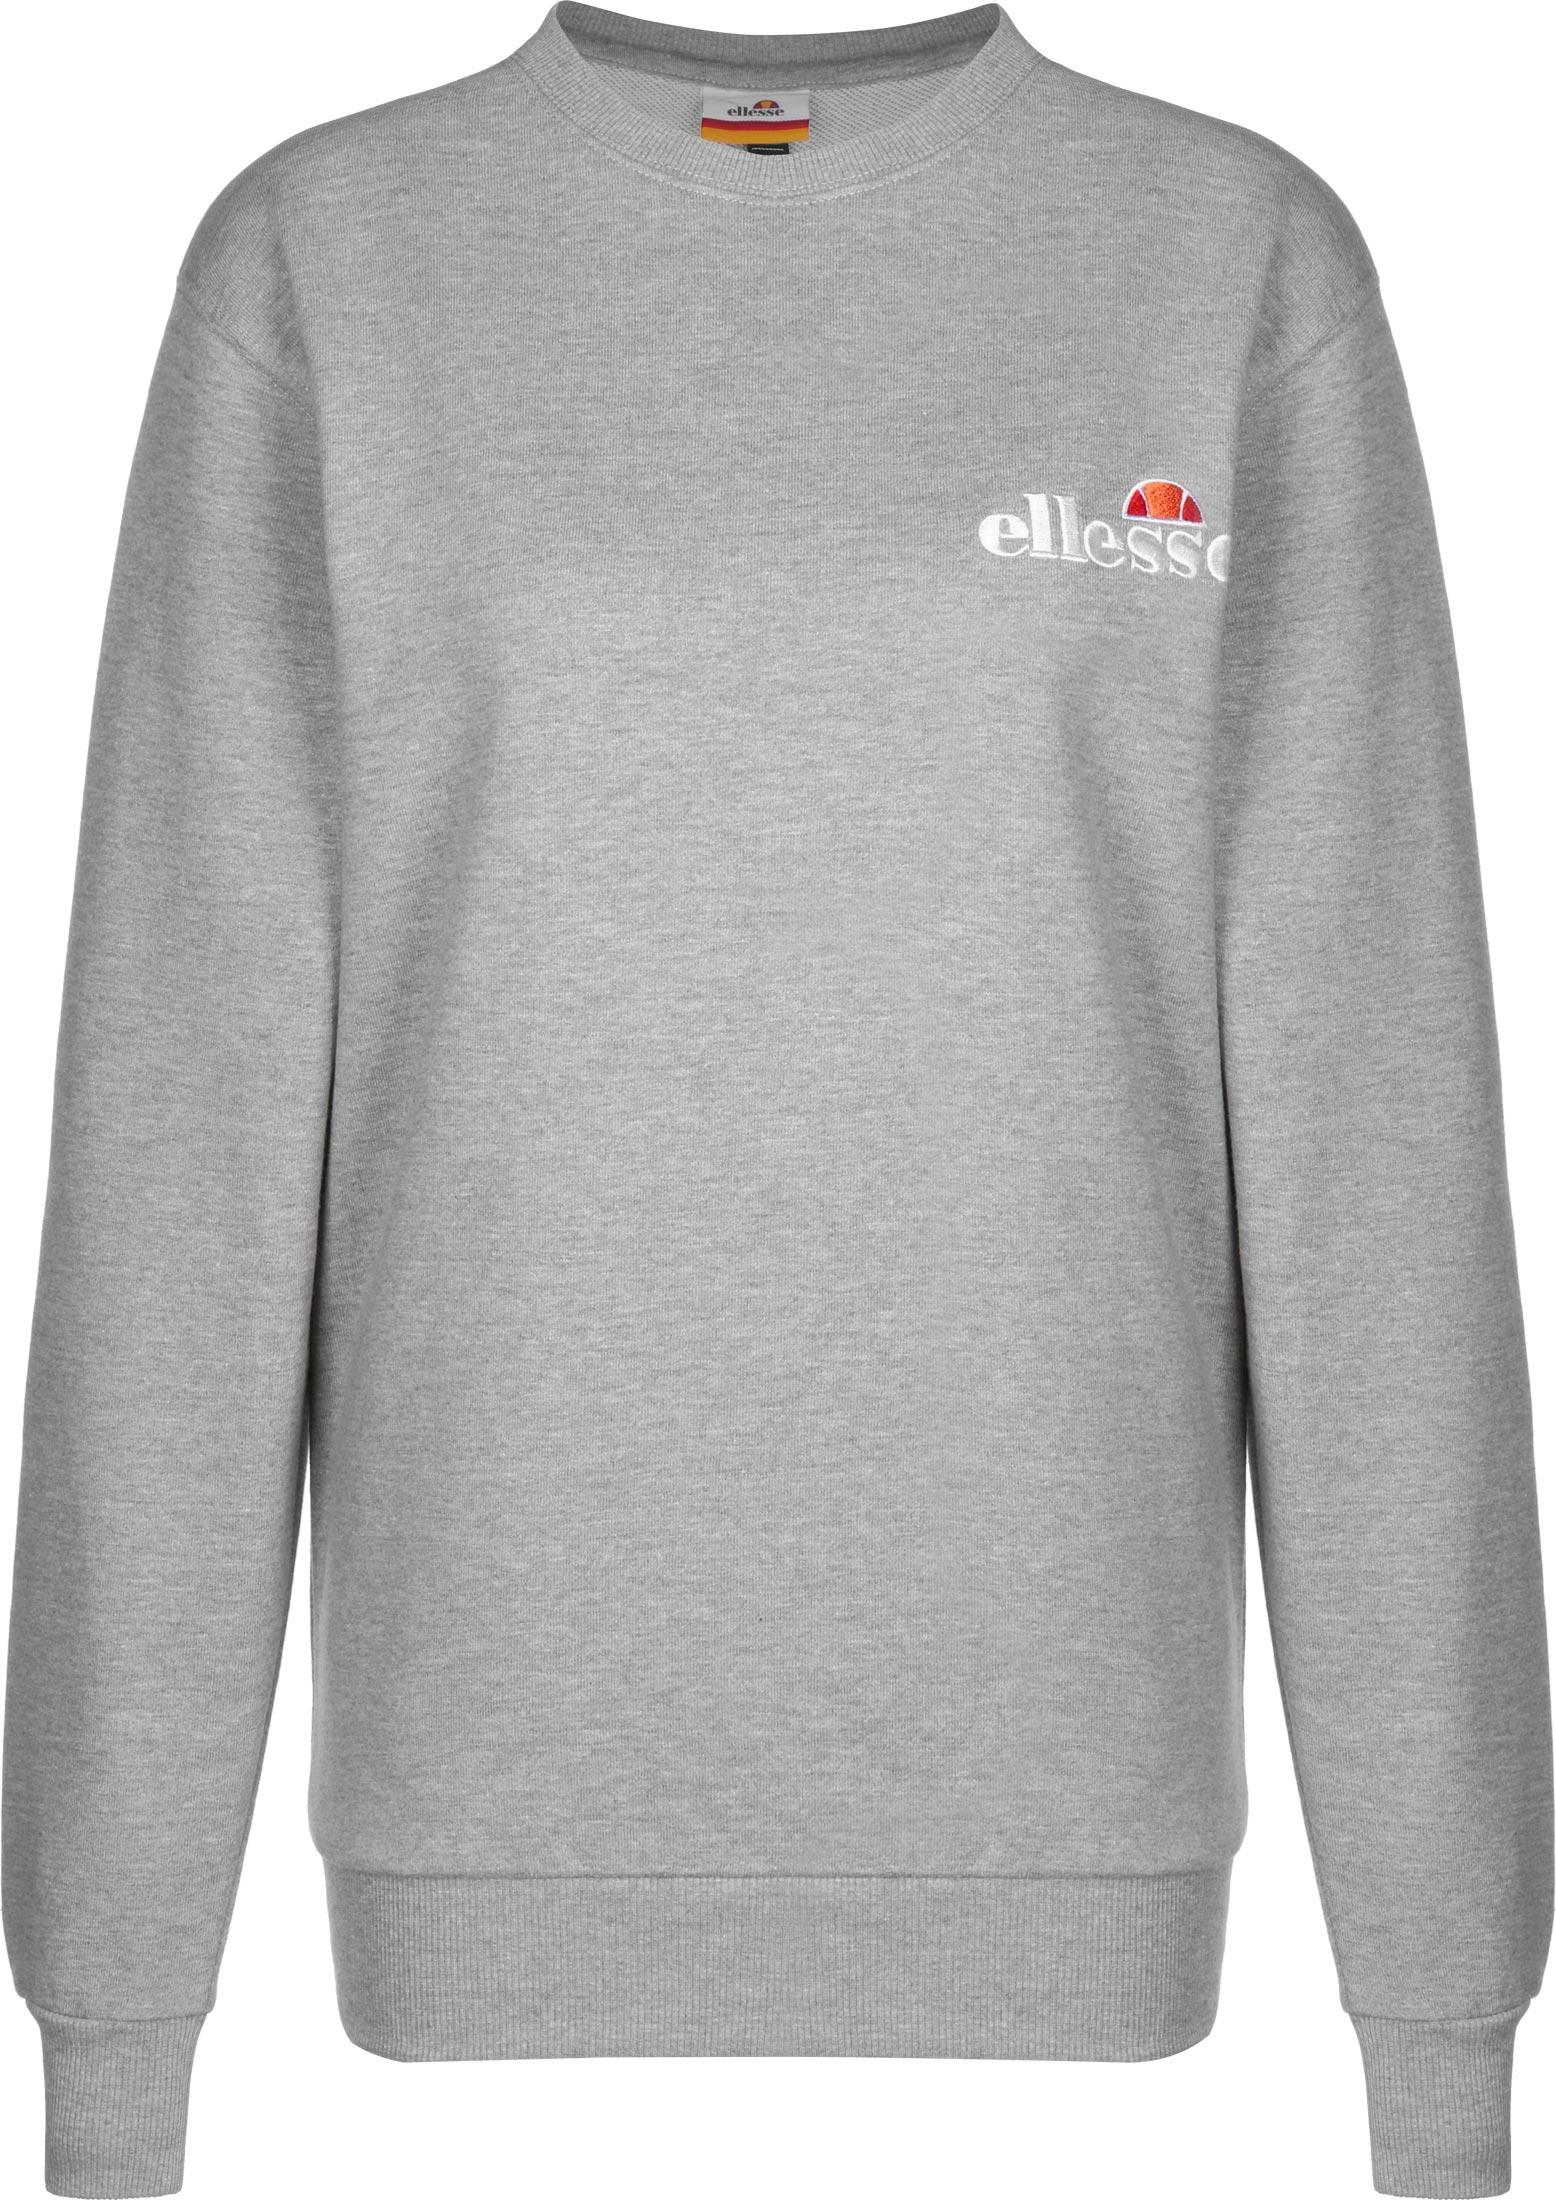 Ellesse Triome Sweatshirts bij Stylefile